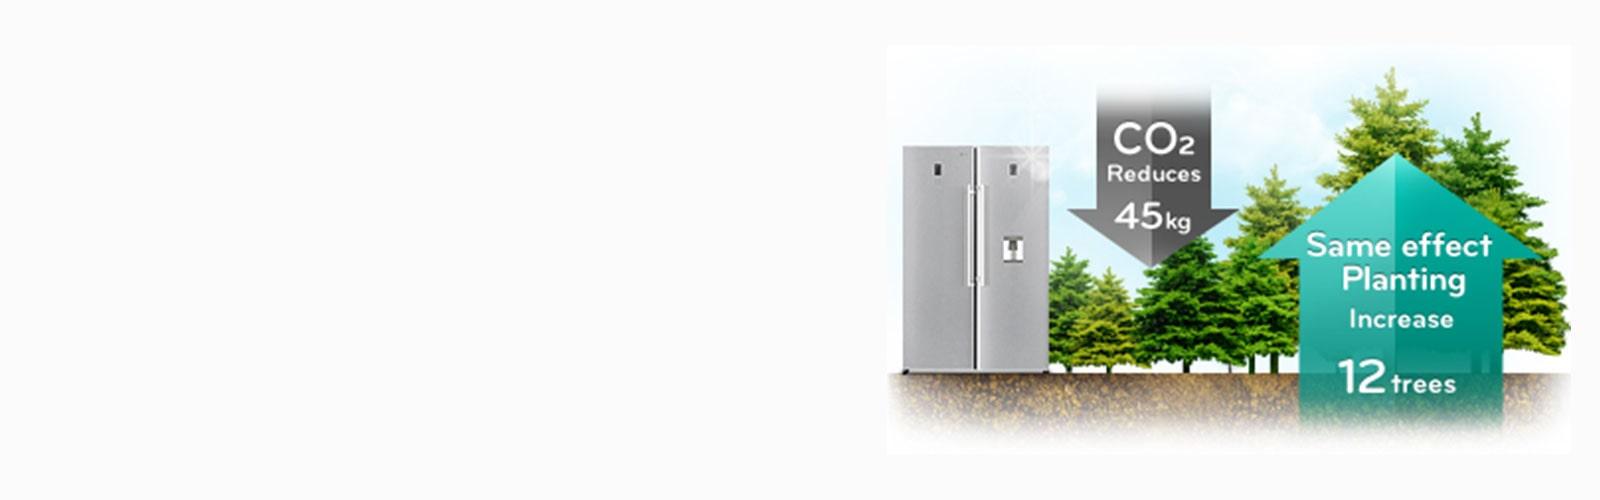 GC-B404ELRZ_lg-refrigerator-lansen-feature_Eco_Friendly_D_24072019